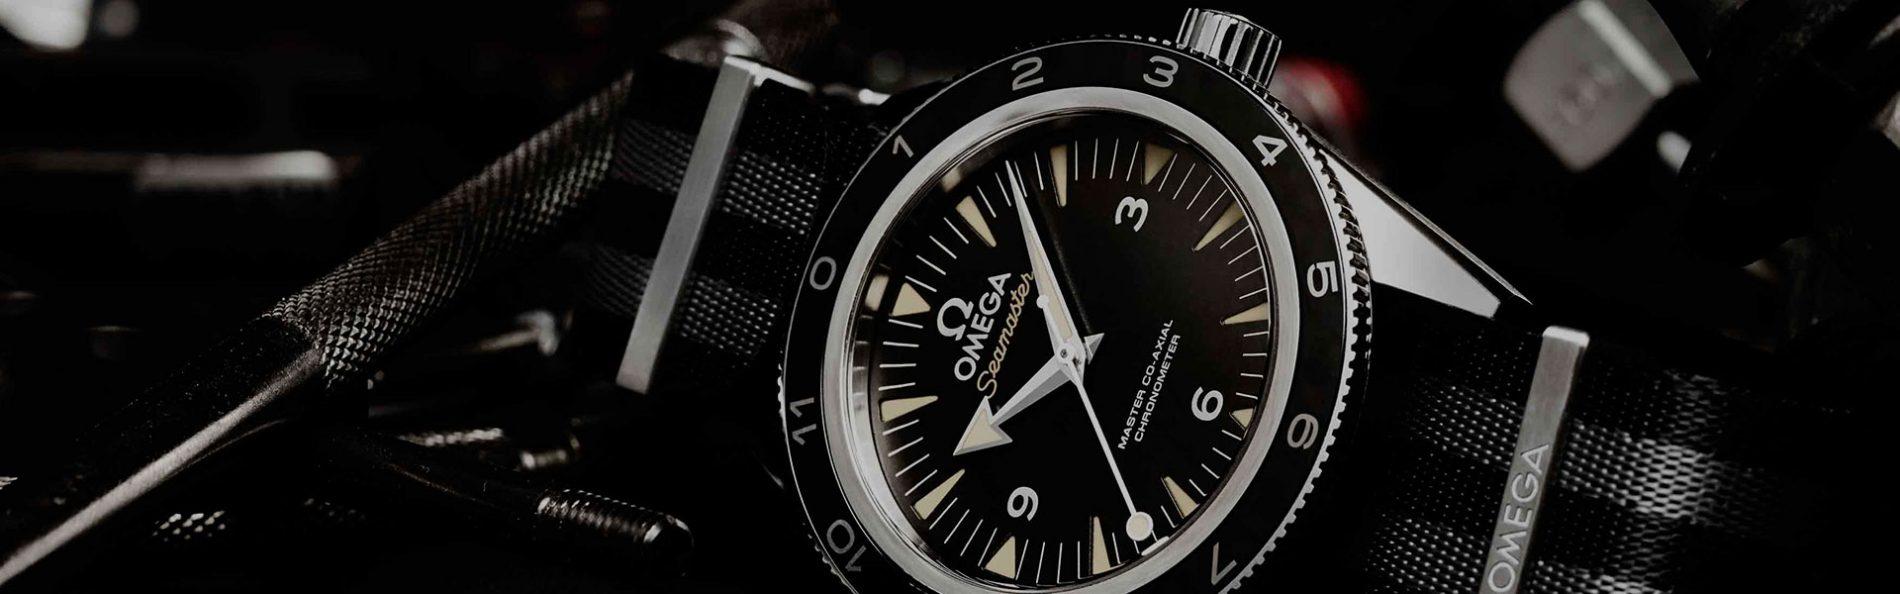 Horloges Omega